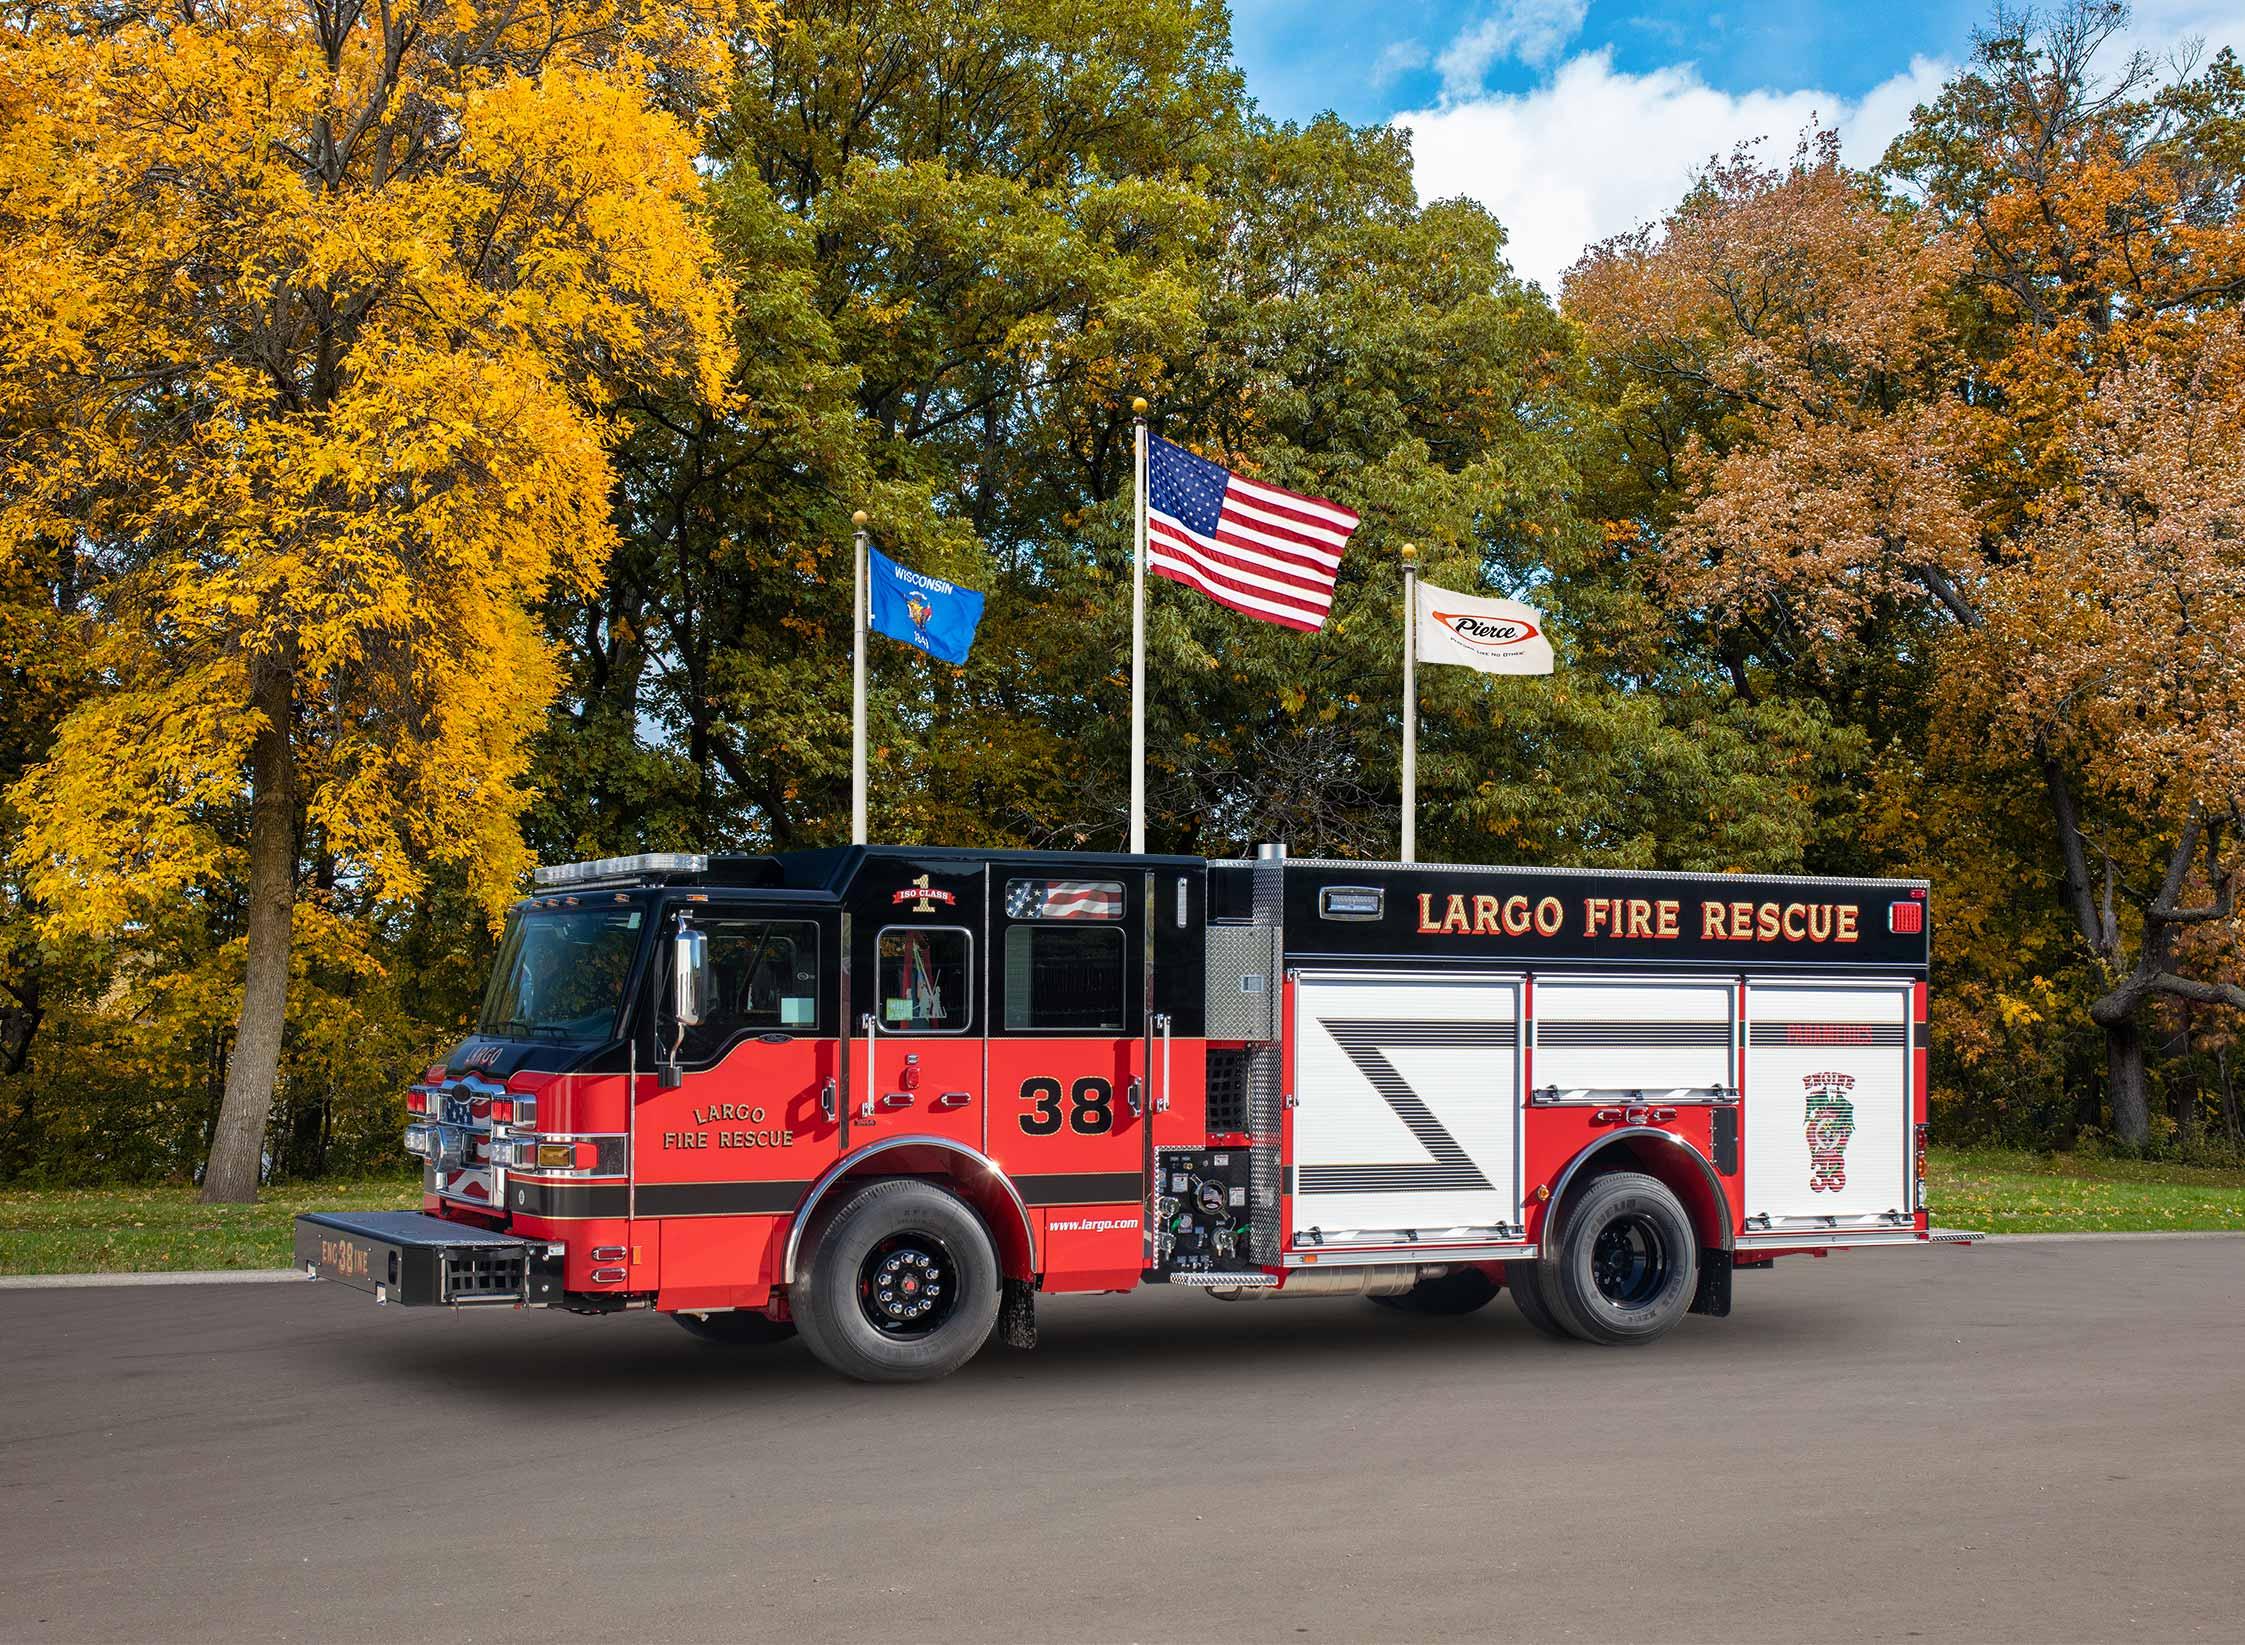 City of Largo Fire Department - Pumper